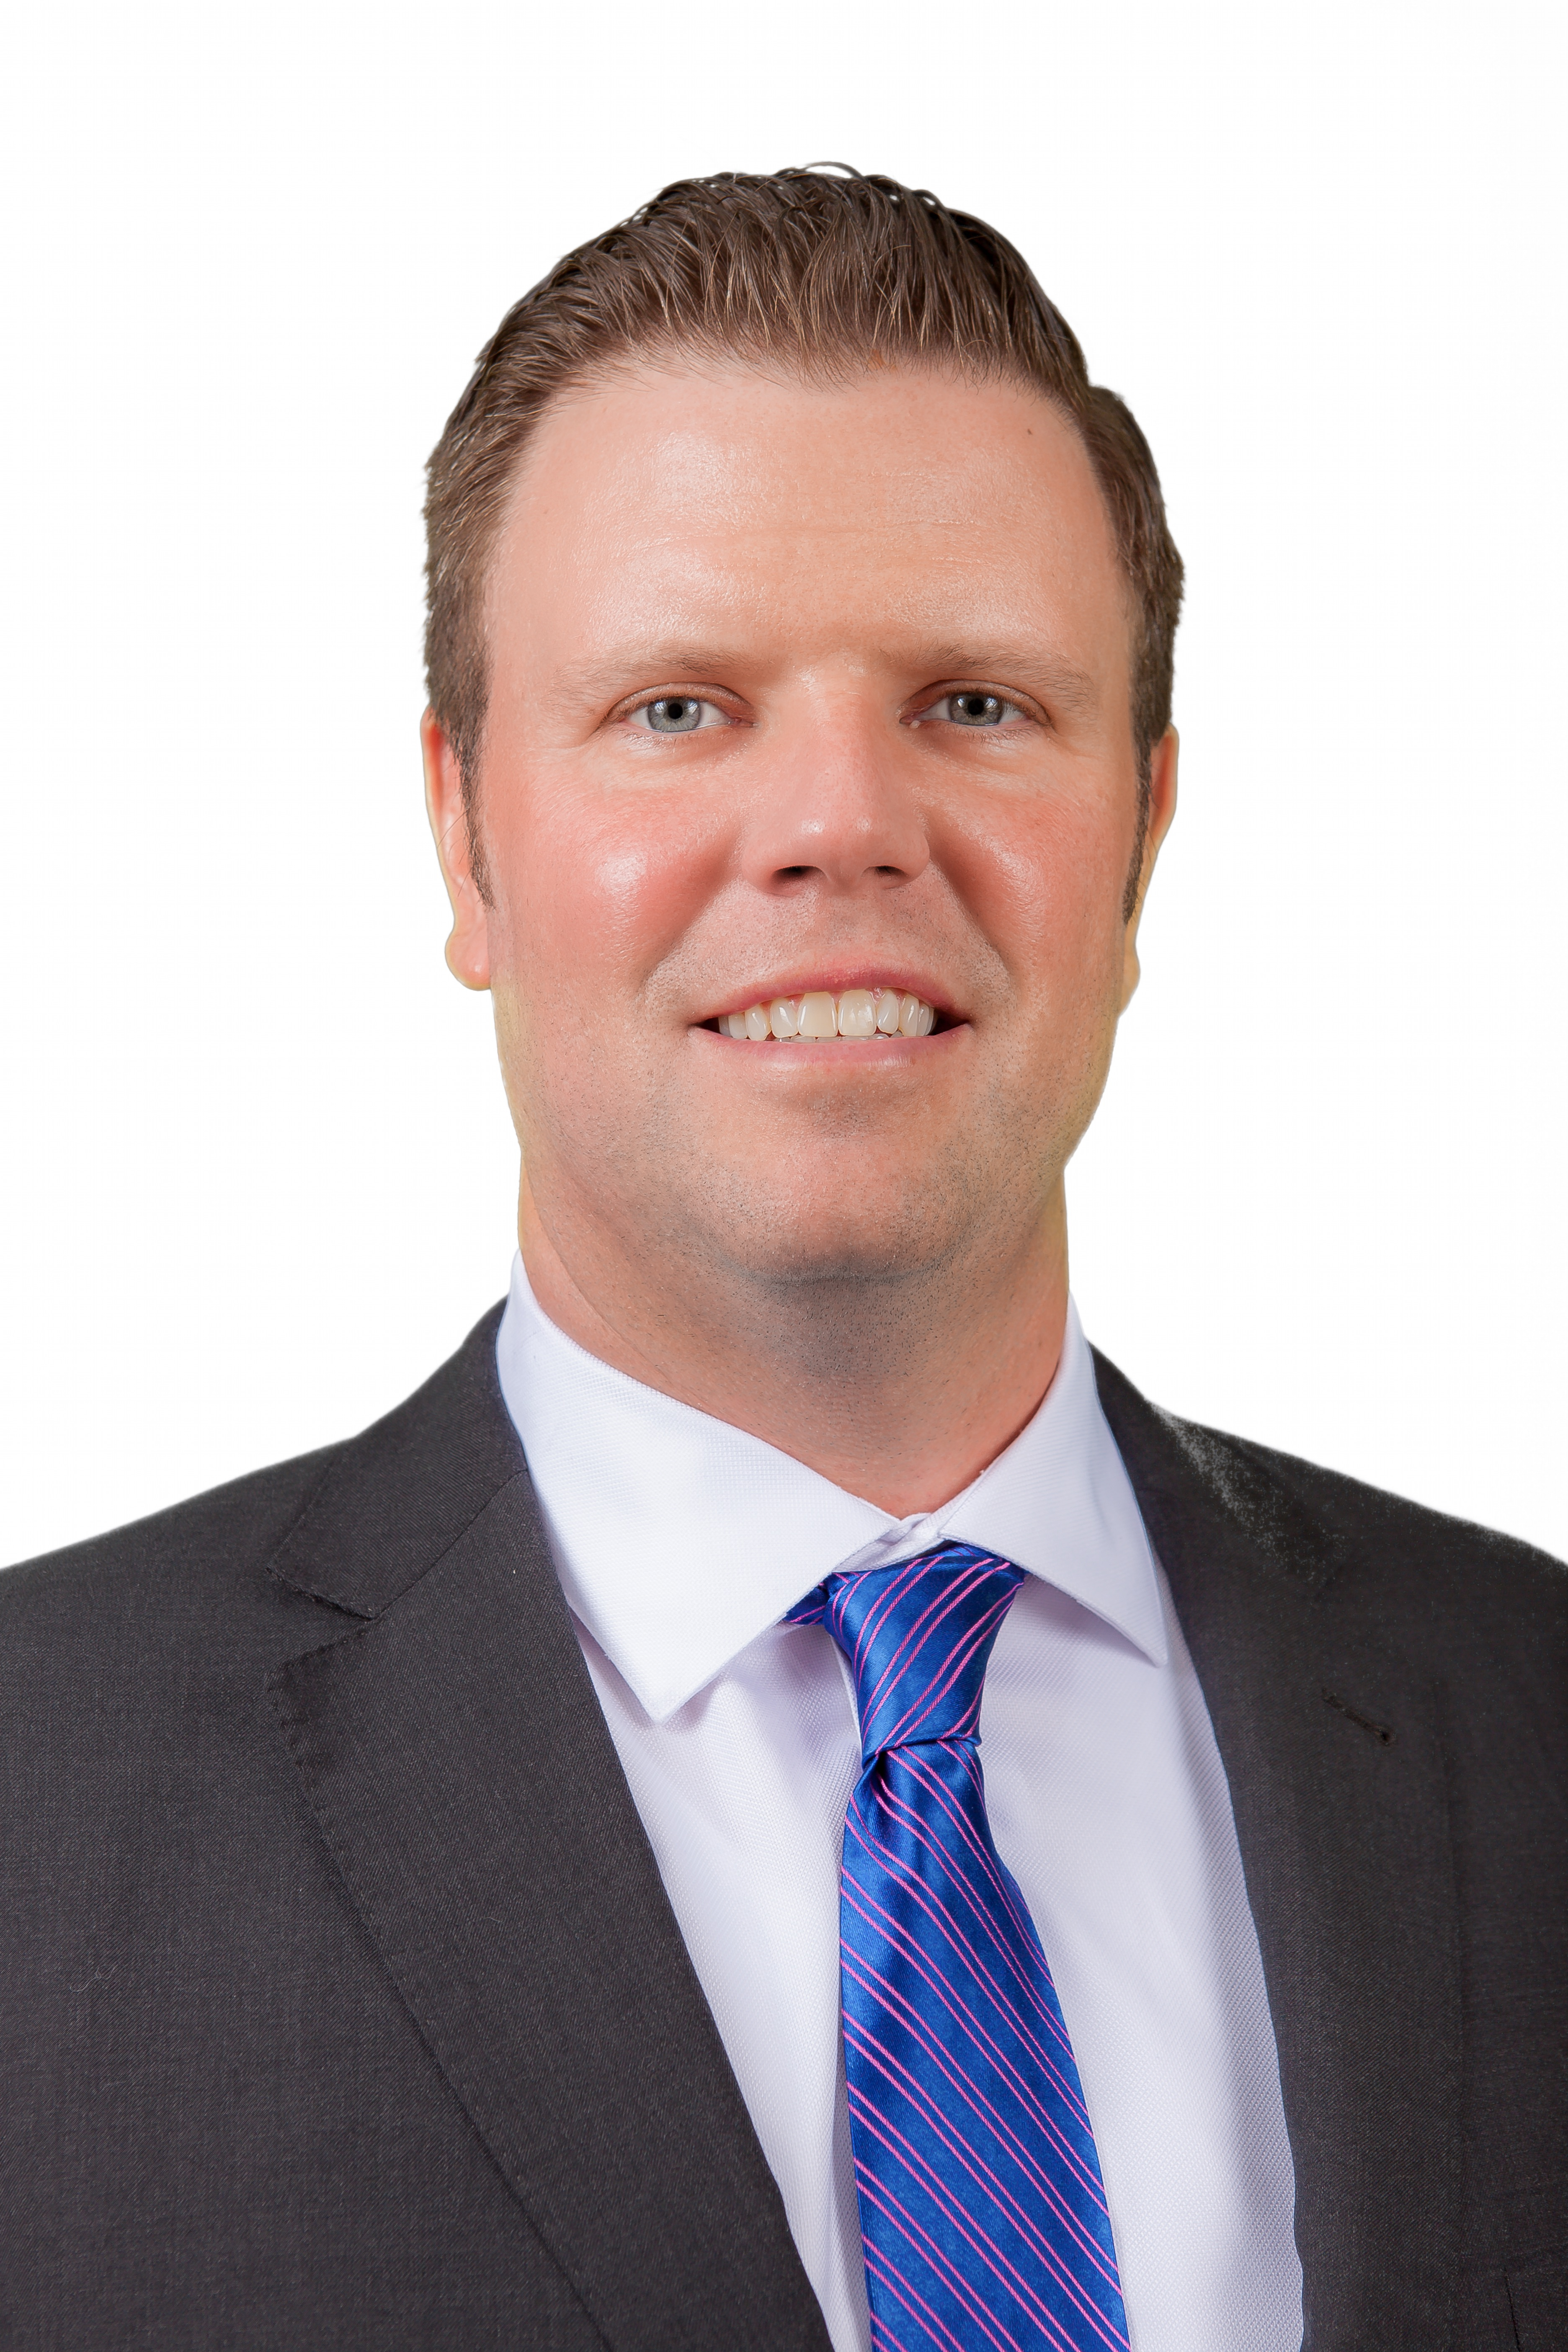 Christopher E. Swanson, MD